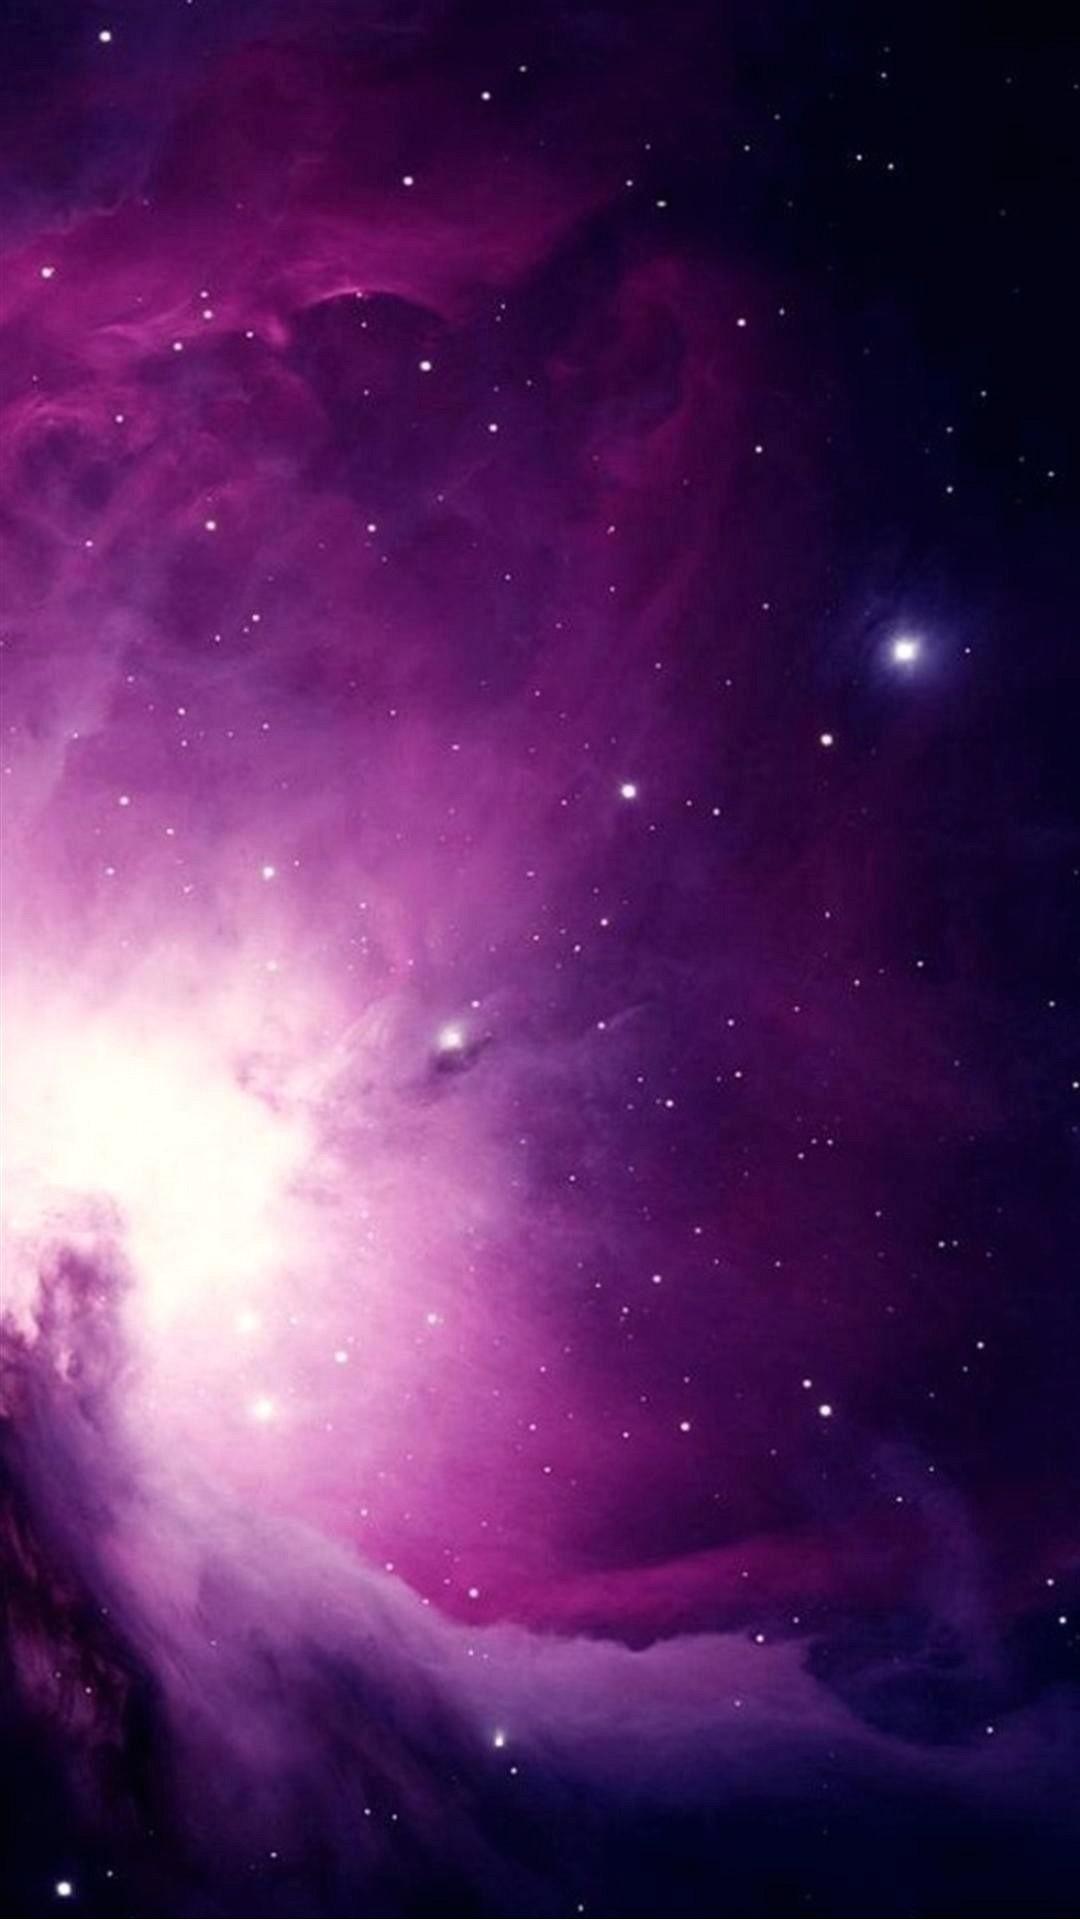 Res: 1080x1920, 2OtvvcI wallpaper-full-hd-1080-x-1920-smartphone-violet- ...